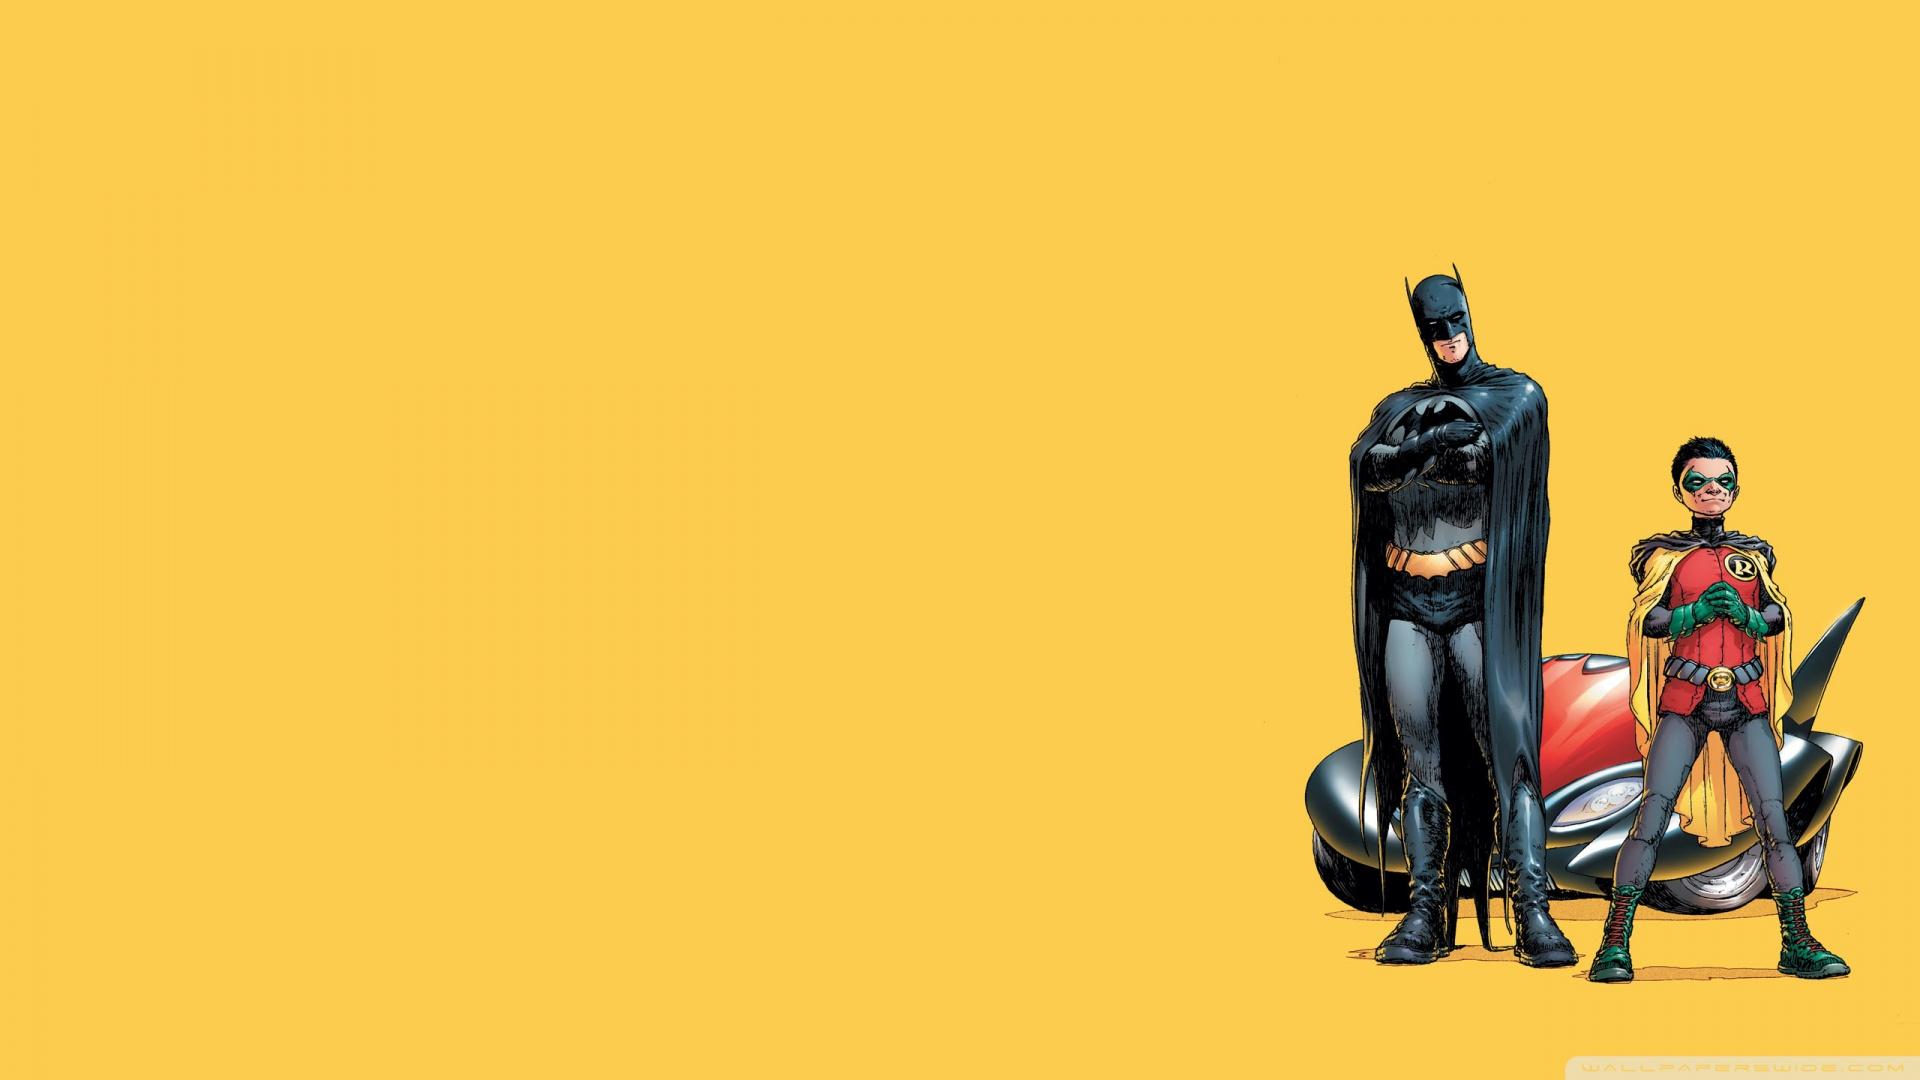 Batman And Robin Cartoon Wallpaper 1920x1080 Batman And Robin 1920x1080